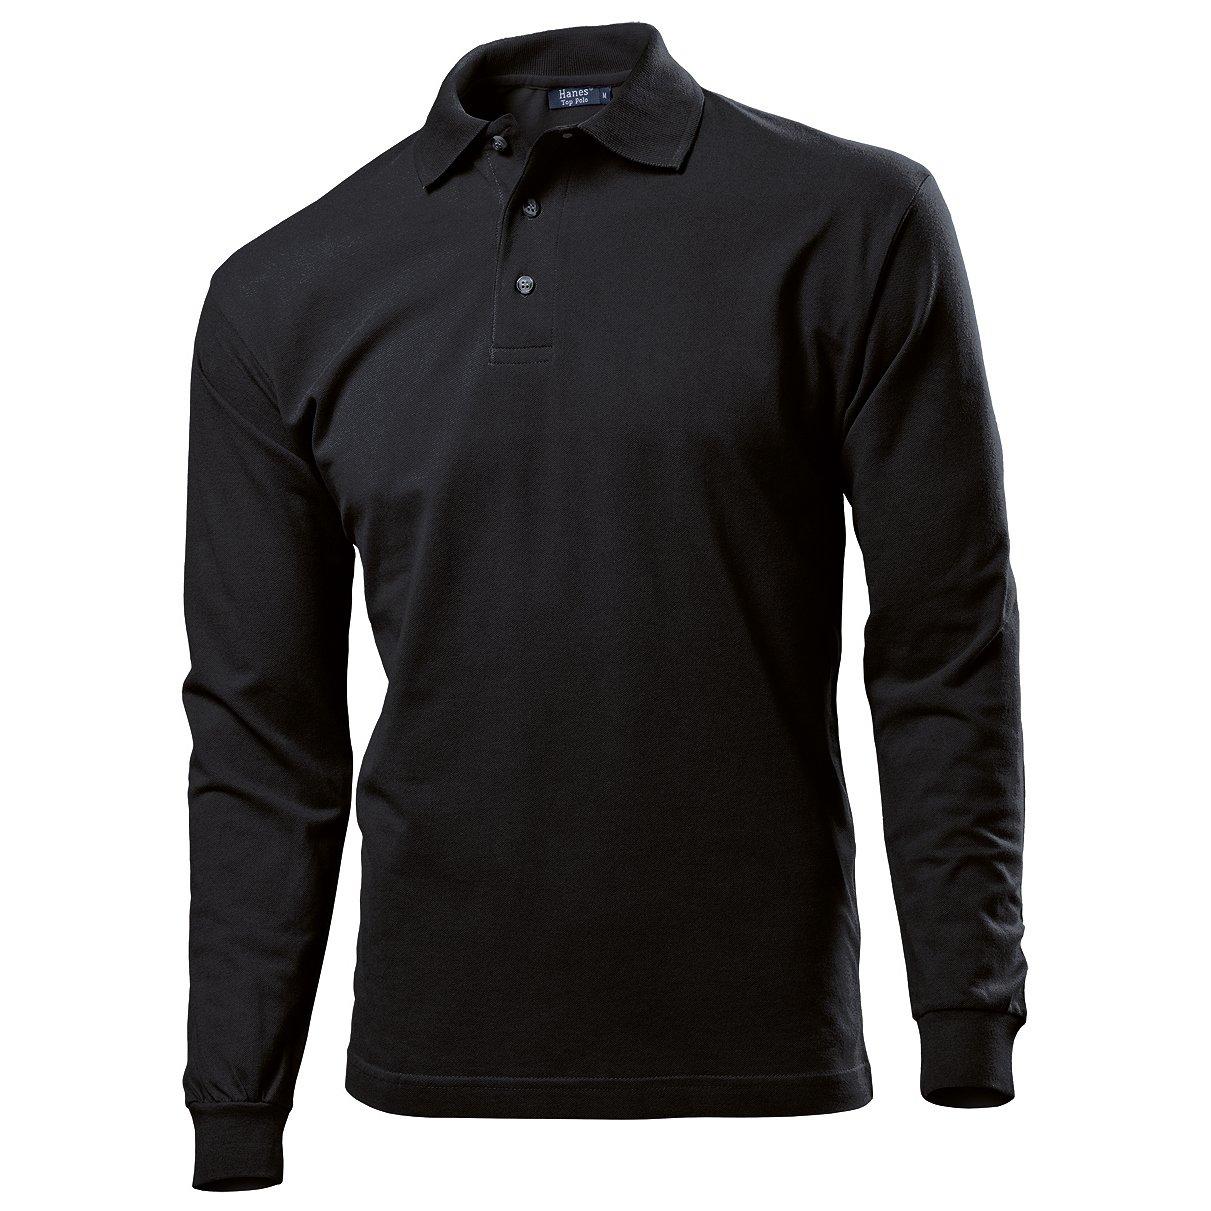 Black t shirt hanes - Hanes Mens Long Sleeve Top Plain Polo Shirt S Black At Amazon Men S Clothing Store